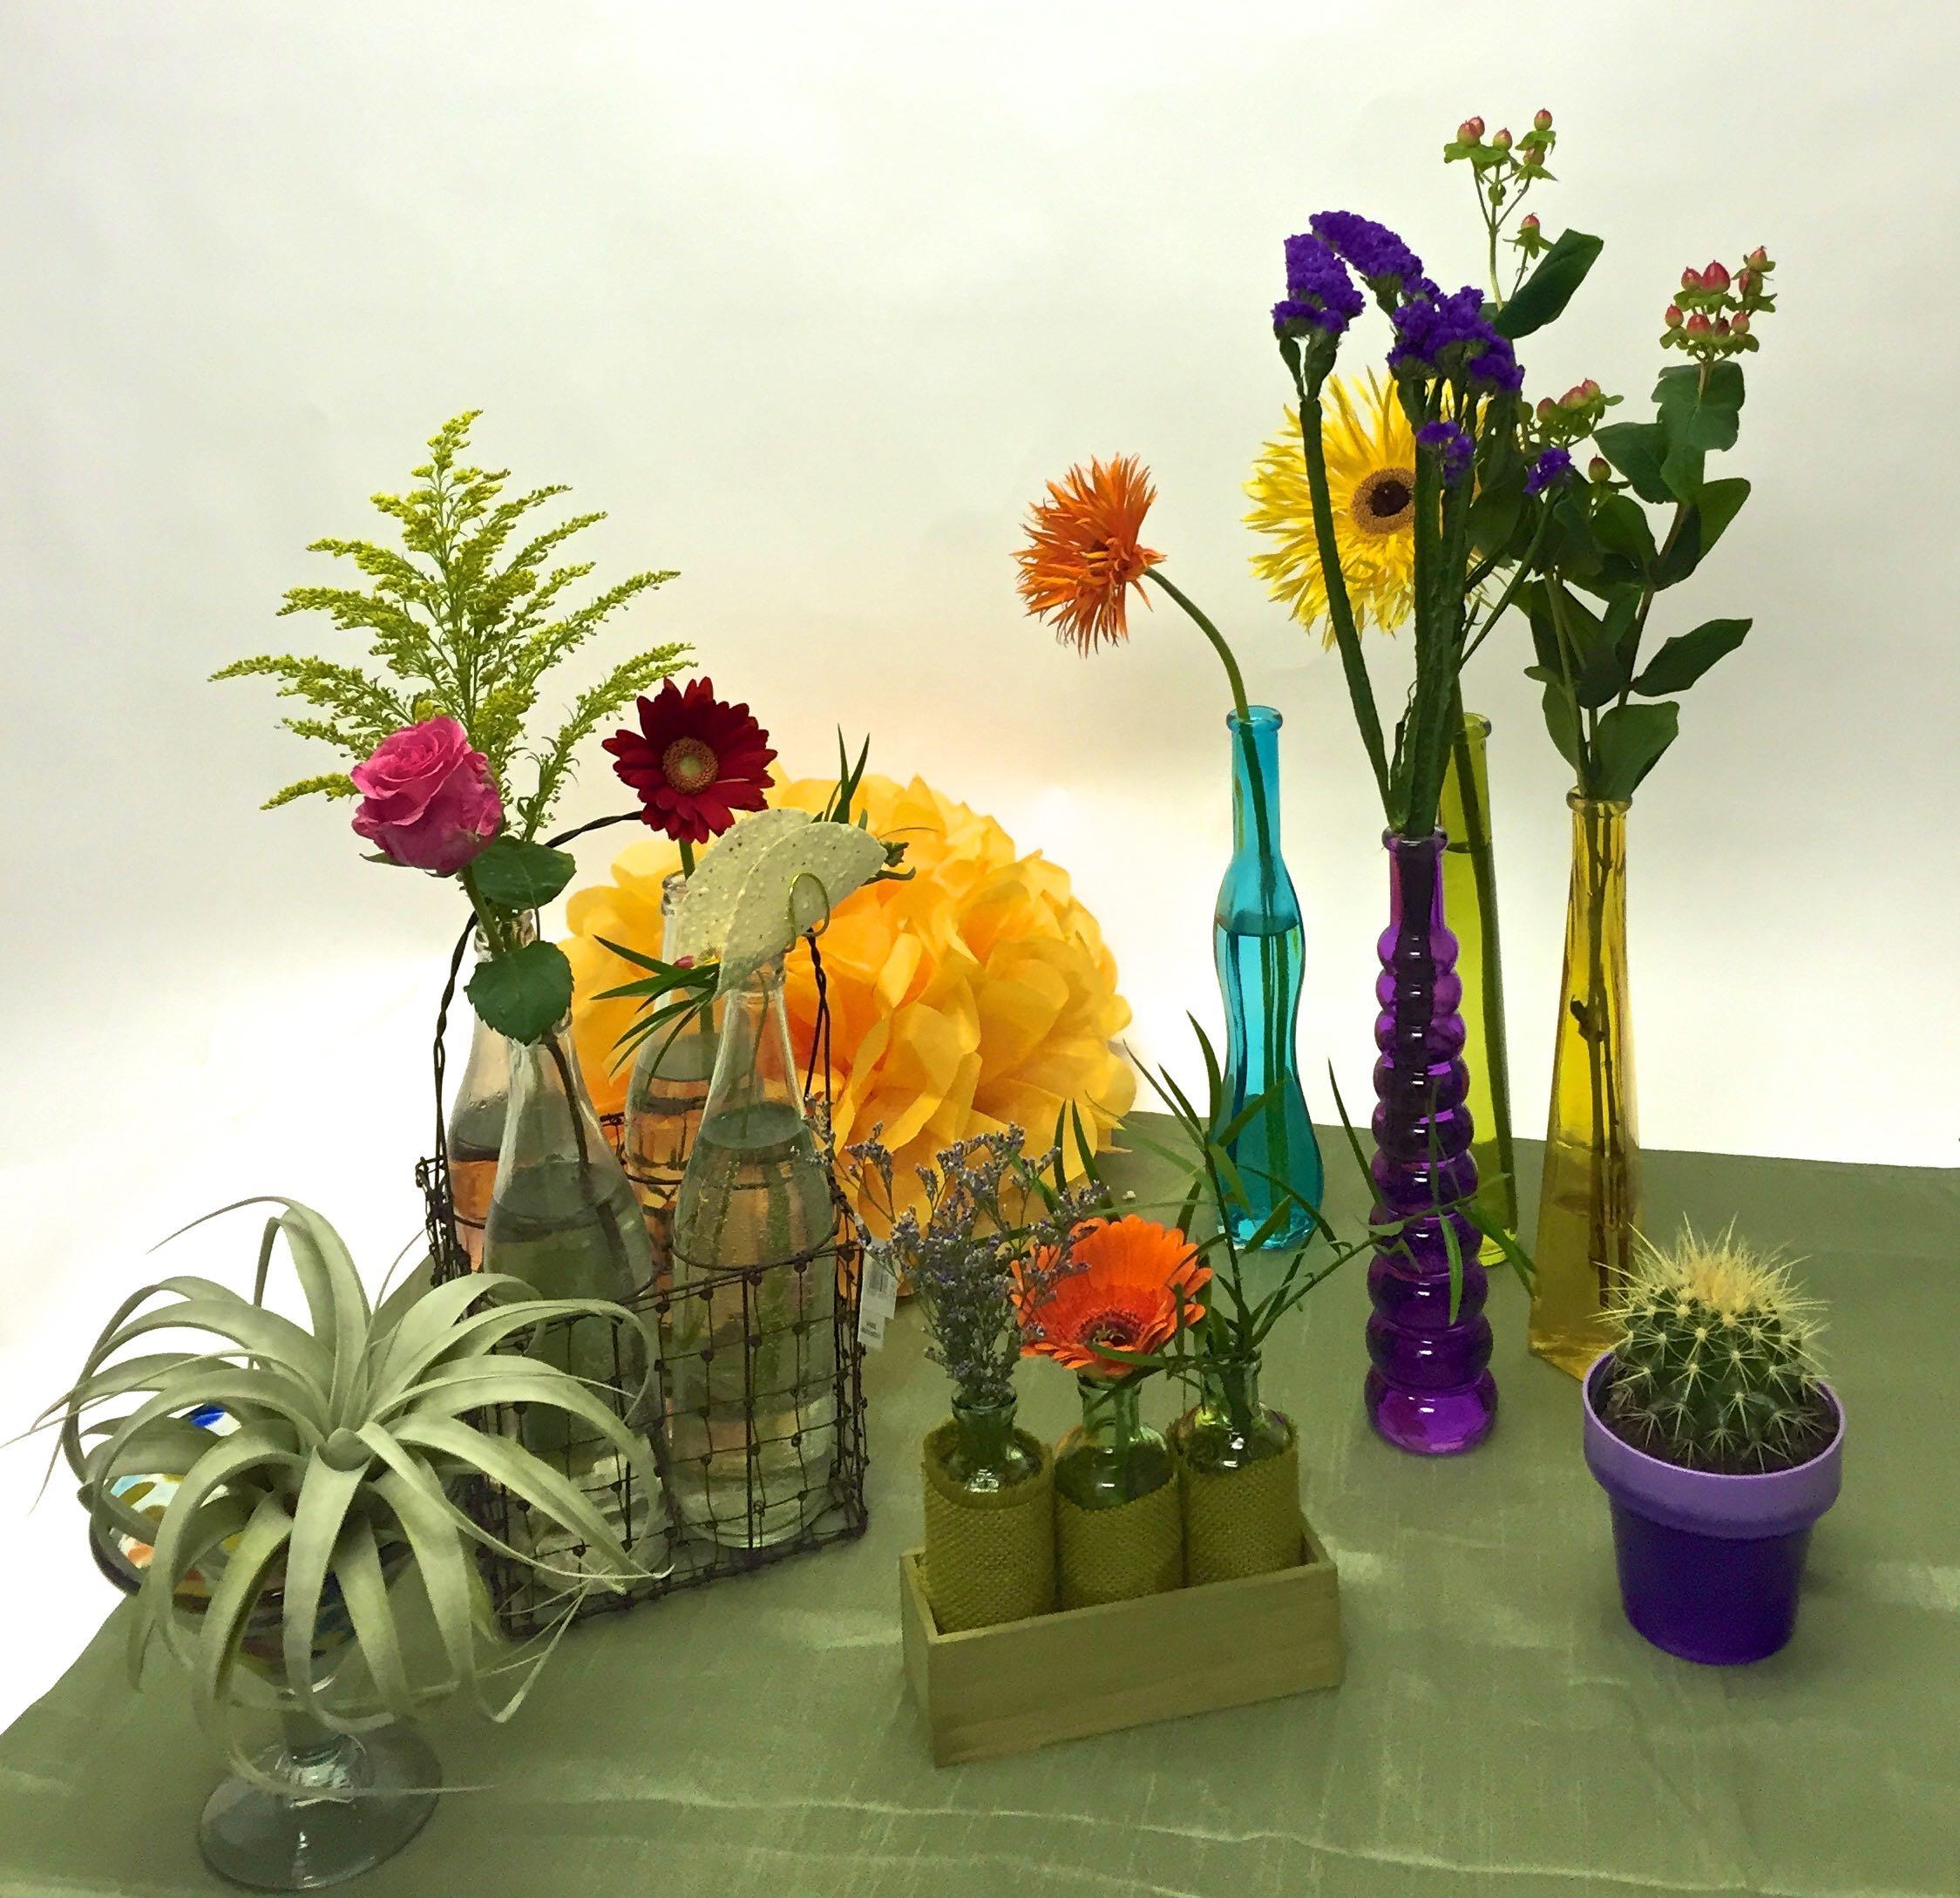 ardith_cincodemayo_cactustacos_florals_spiritedtable_photo1.jpg